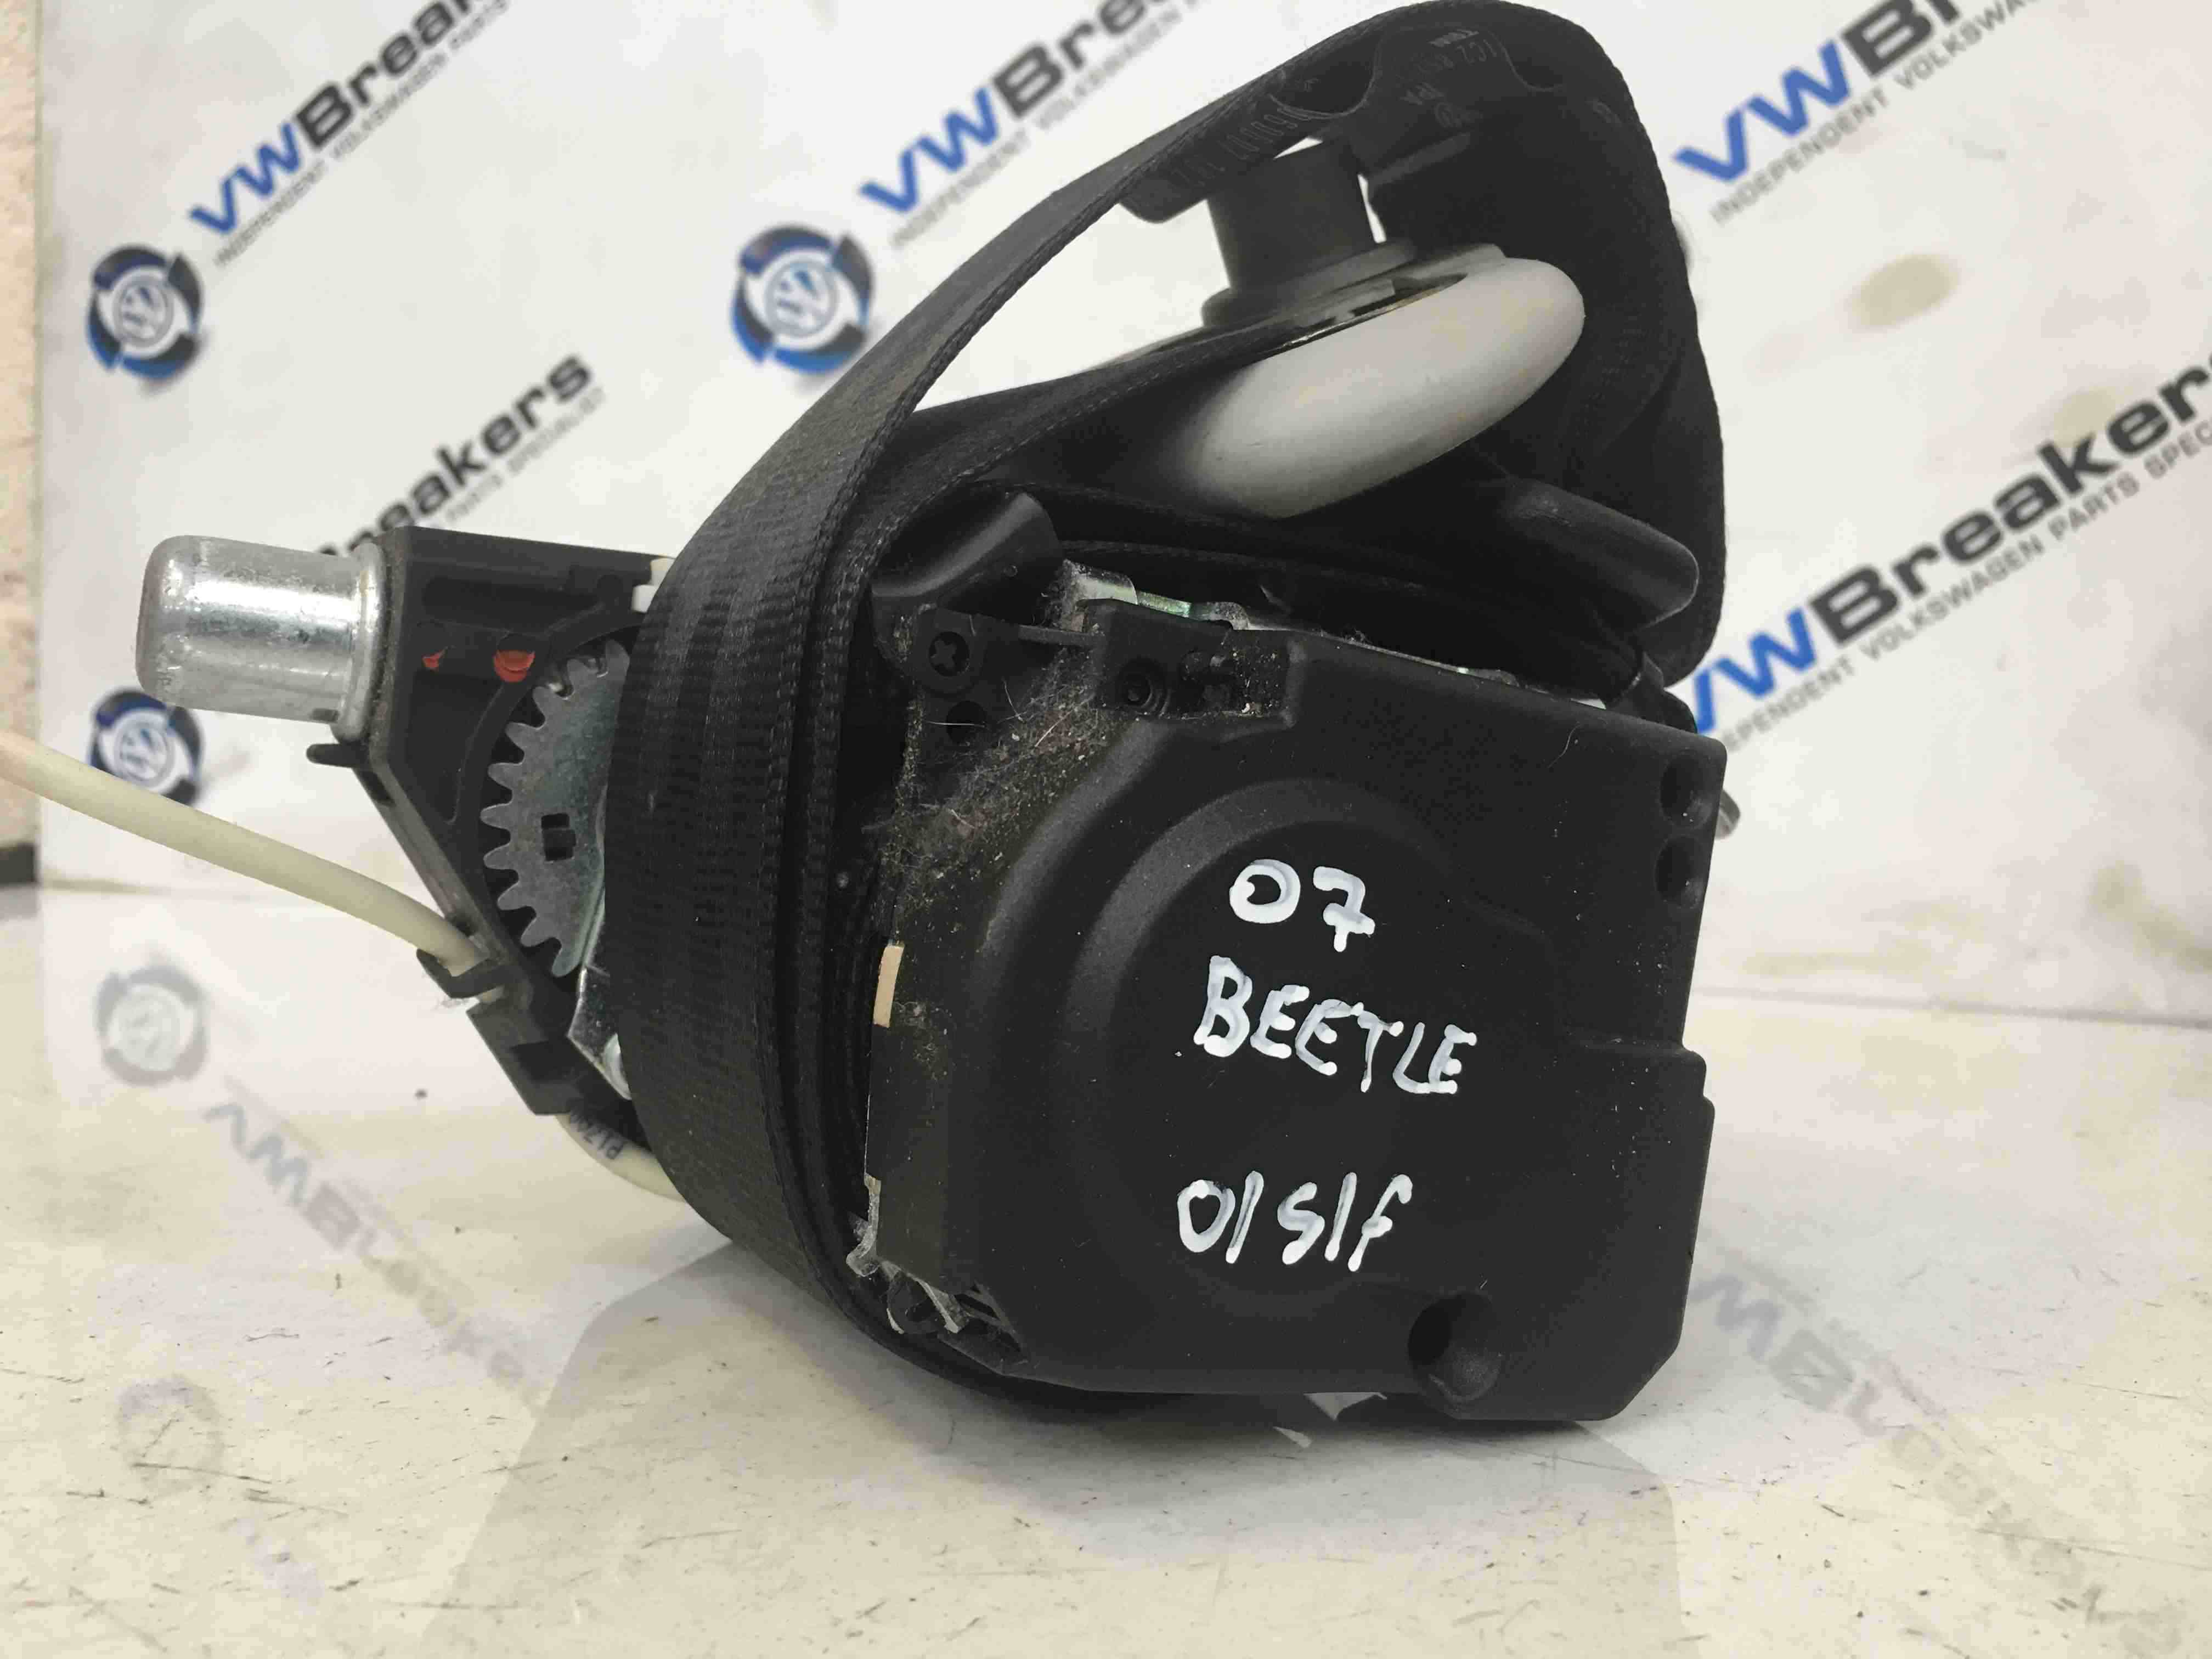 Volkswagen Beetle 2006-2011 Drivers OSF Front Seatbelt